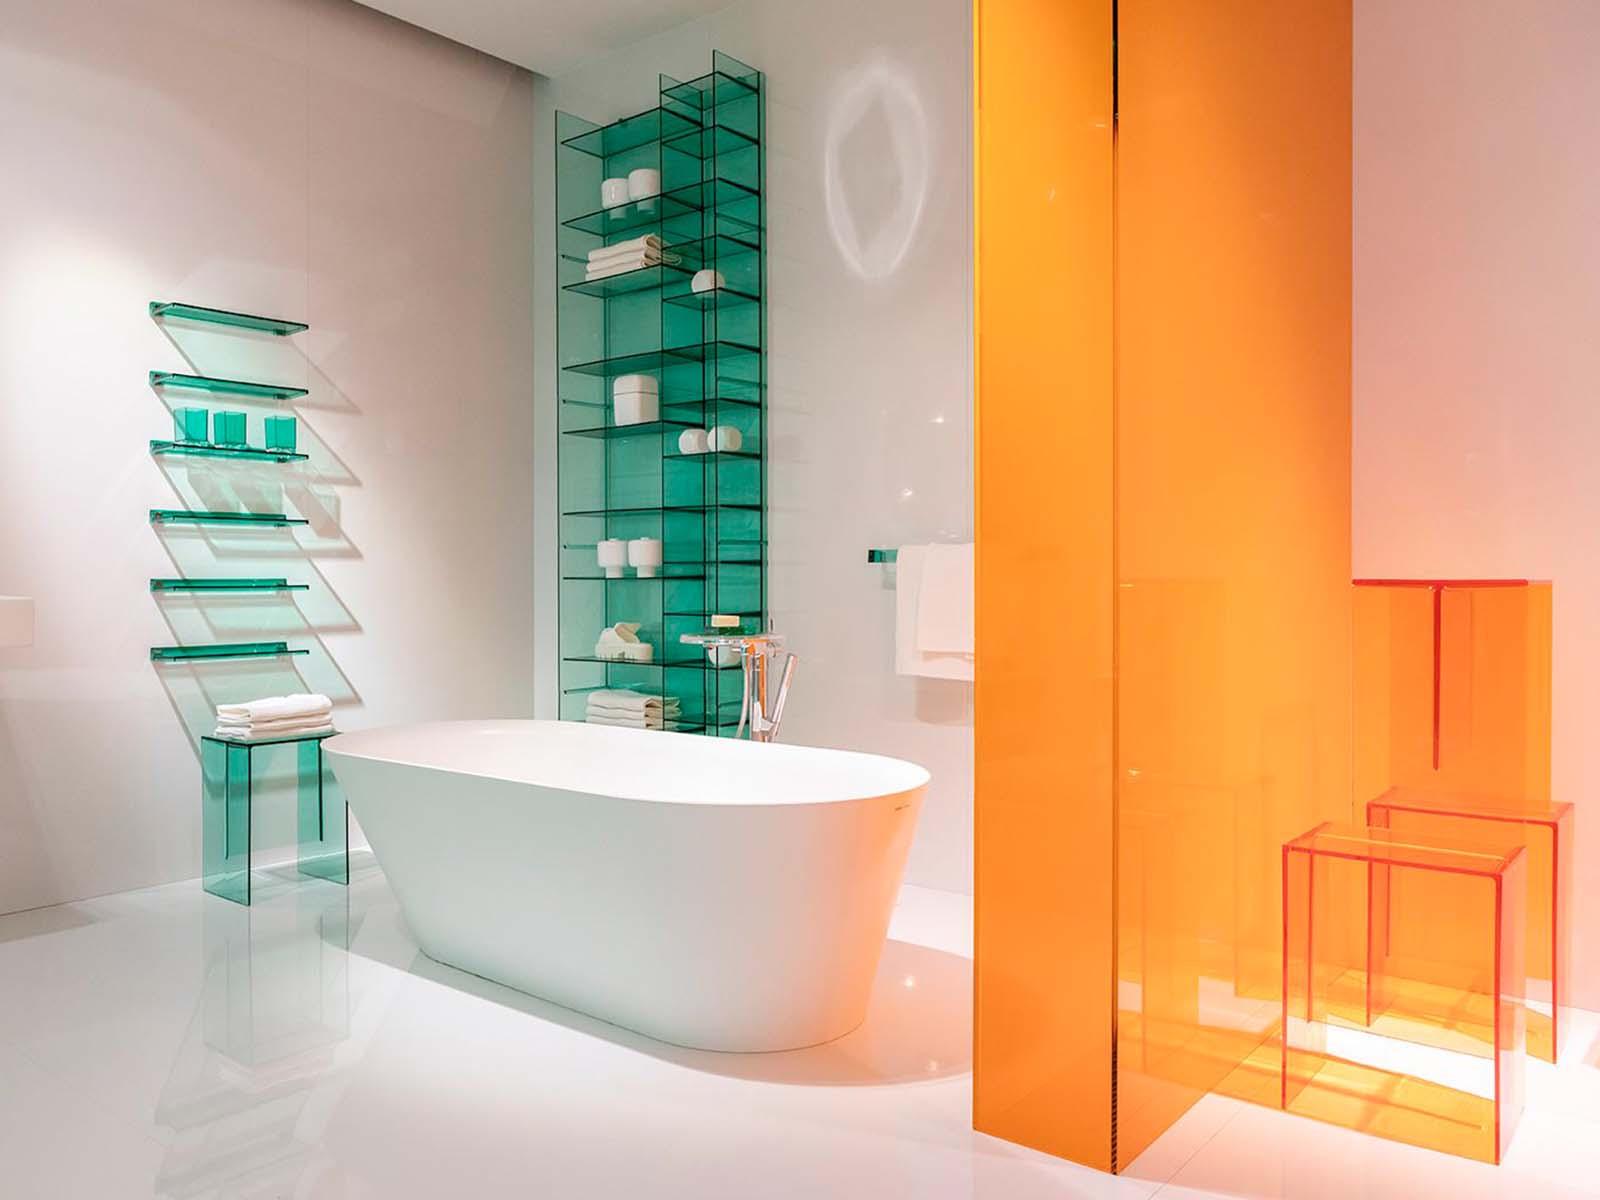 Laufen, International Bathroom Exhibition, Andrea Mariani©.